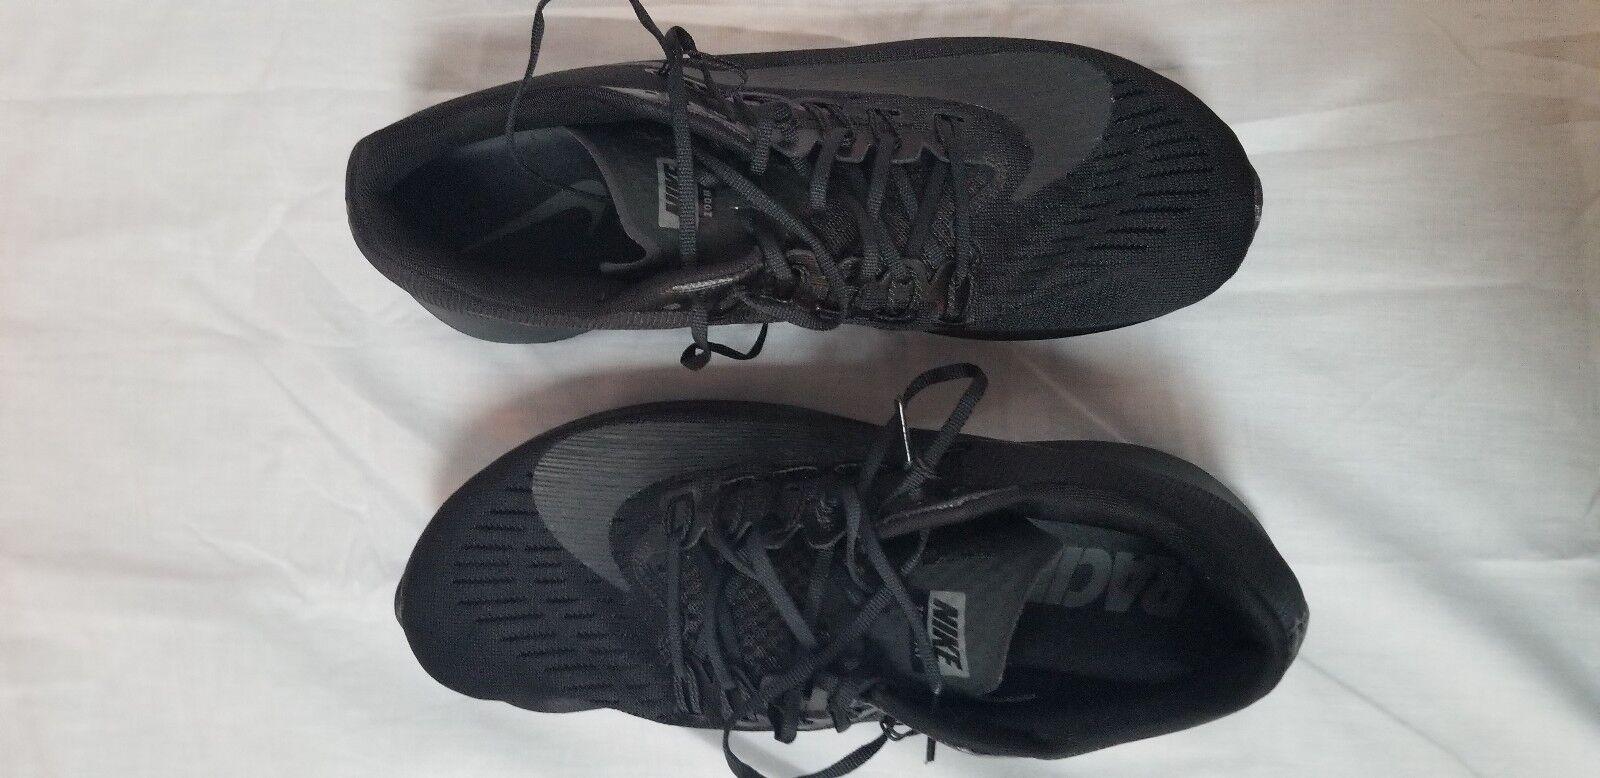 Nike Zoom Fly Men's Running shoes 880848 003 Black & Anthracite NIB  150